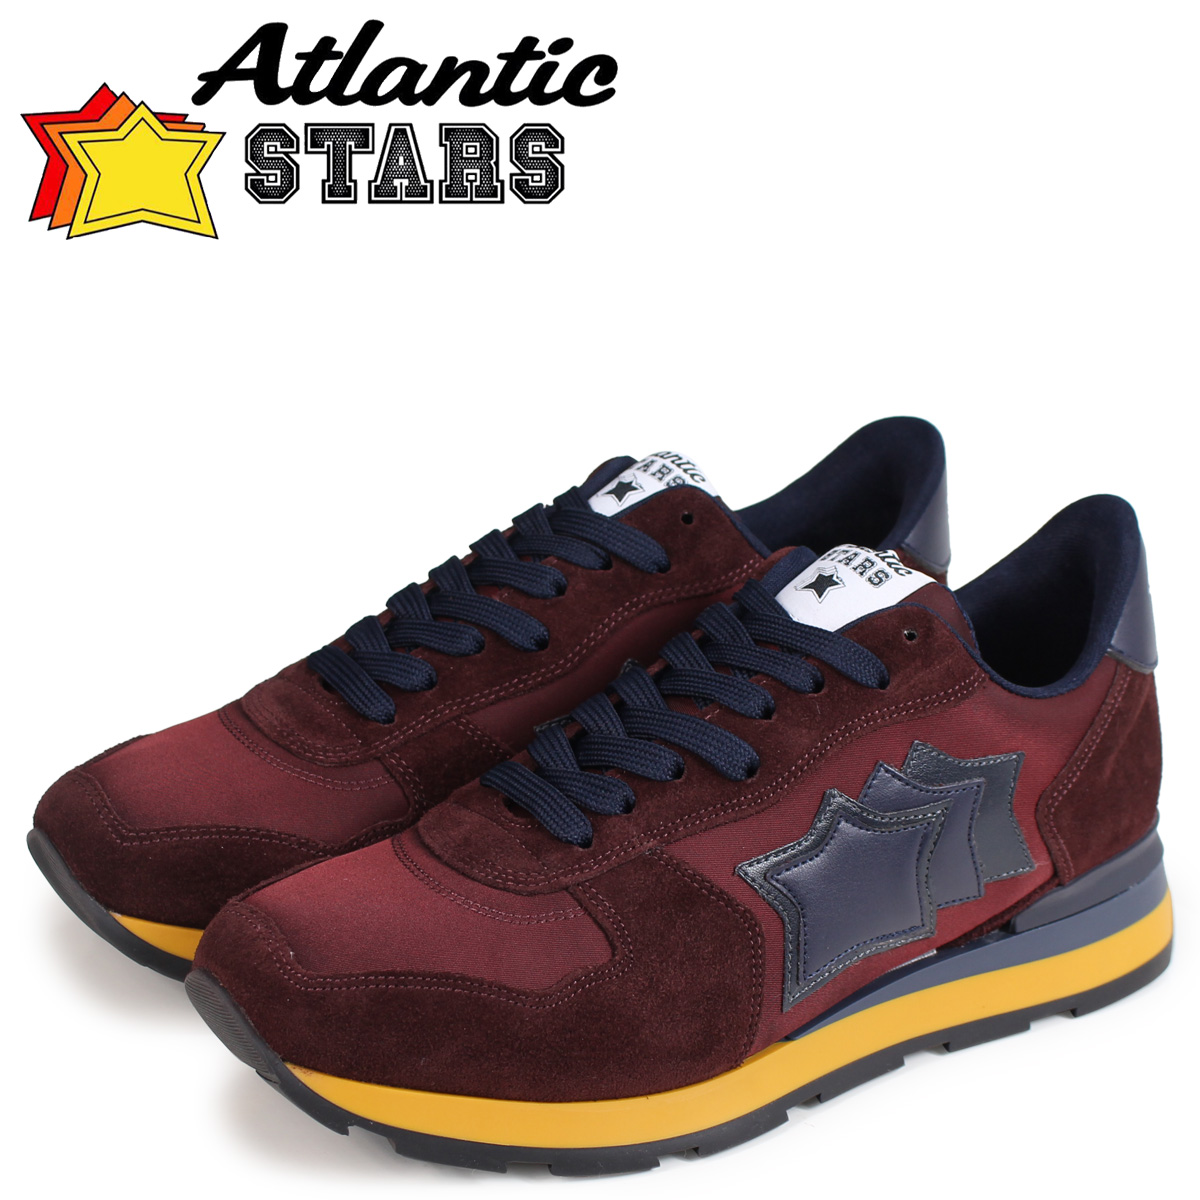 Atlantic STARS メンズ スニーカー アトランティックスターズ アンタレス ANTARES BCN-02NY ブラウン